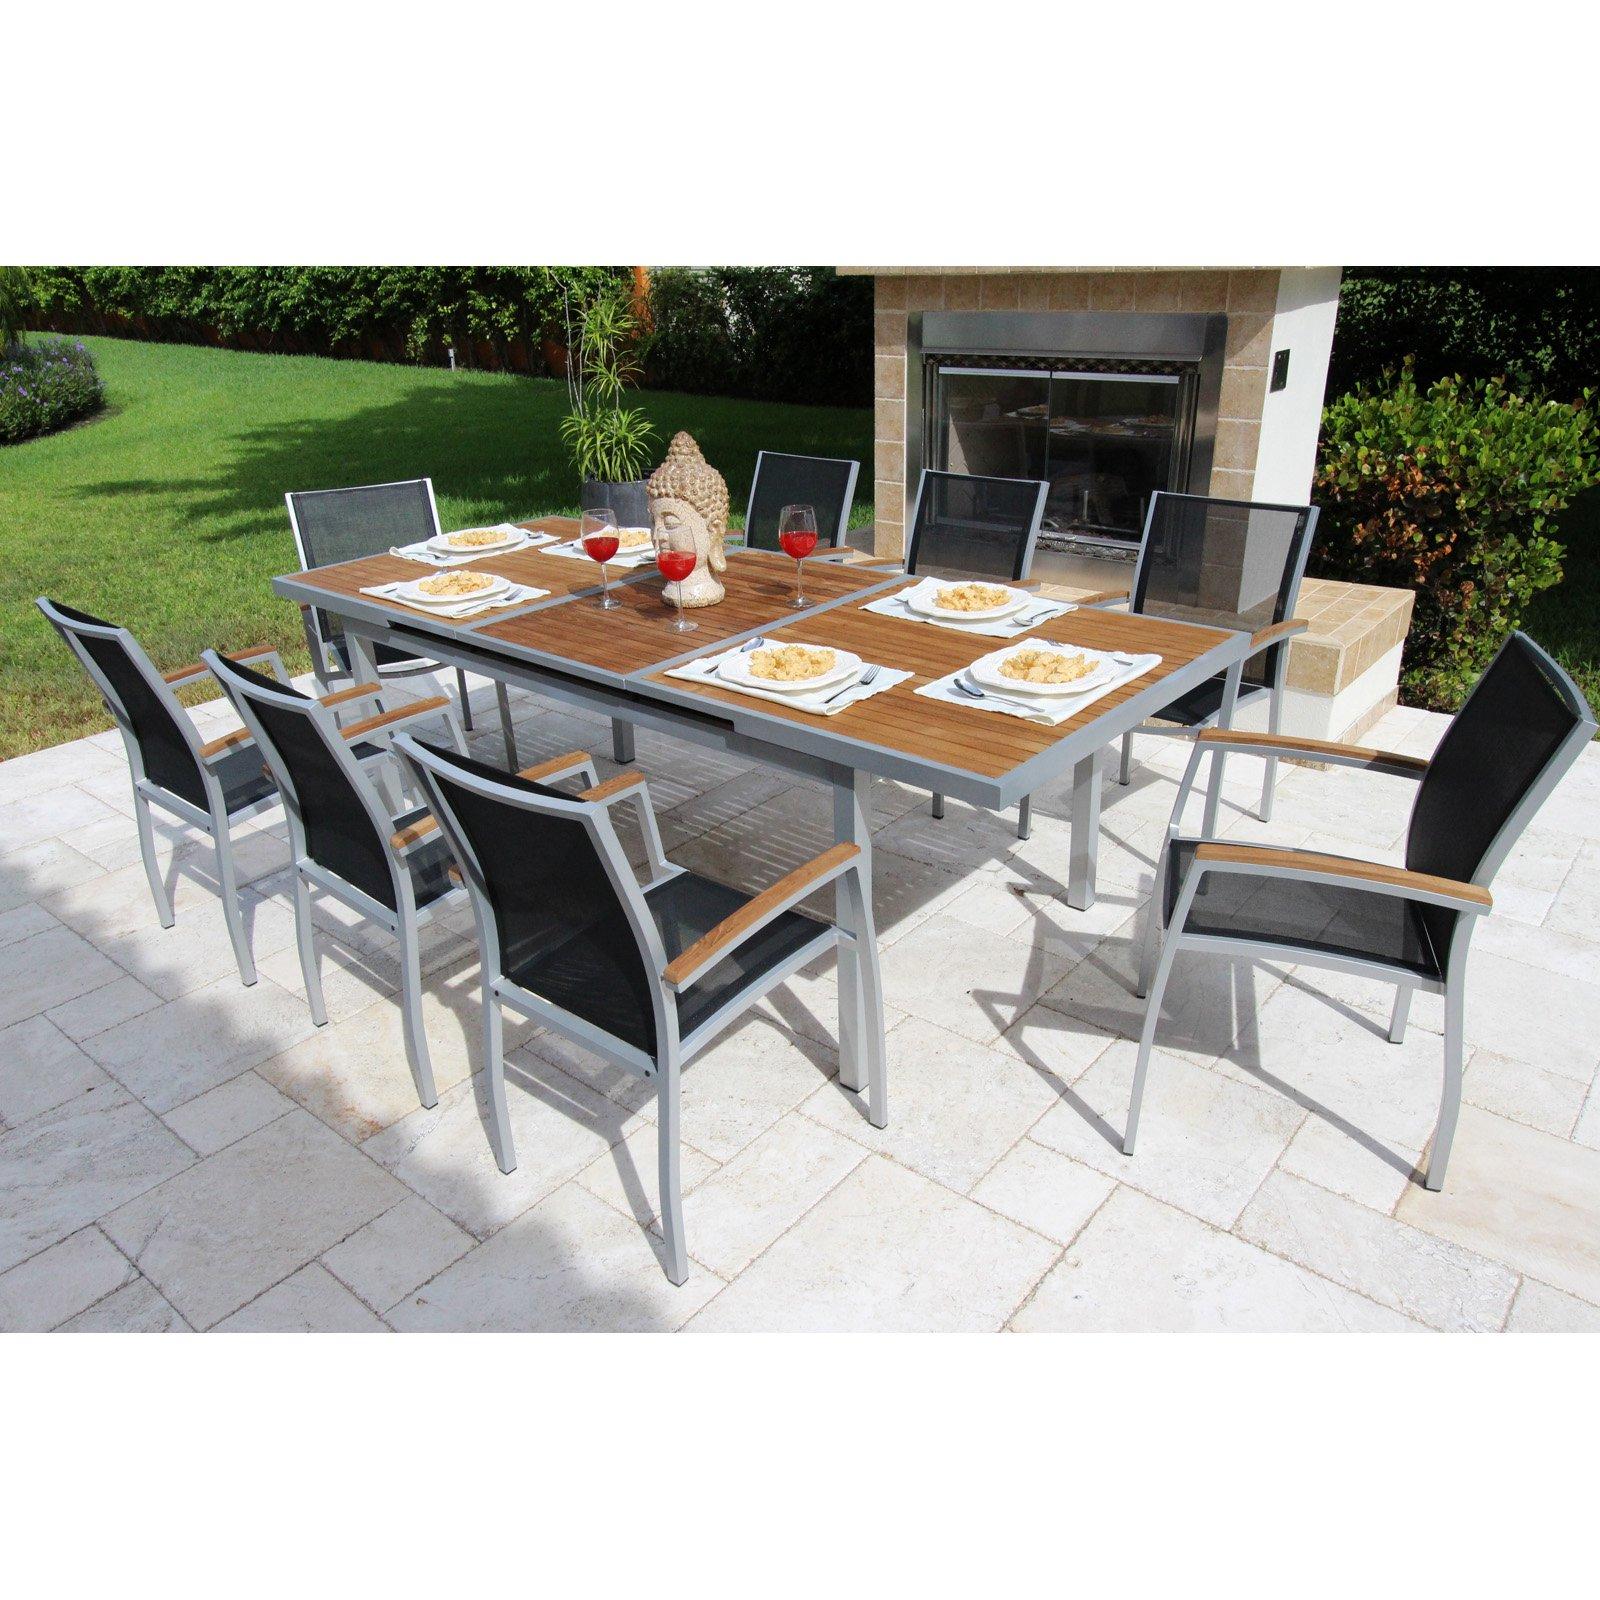 Galliano 9-Piece Dining Set